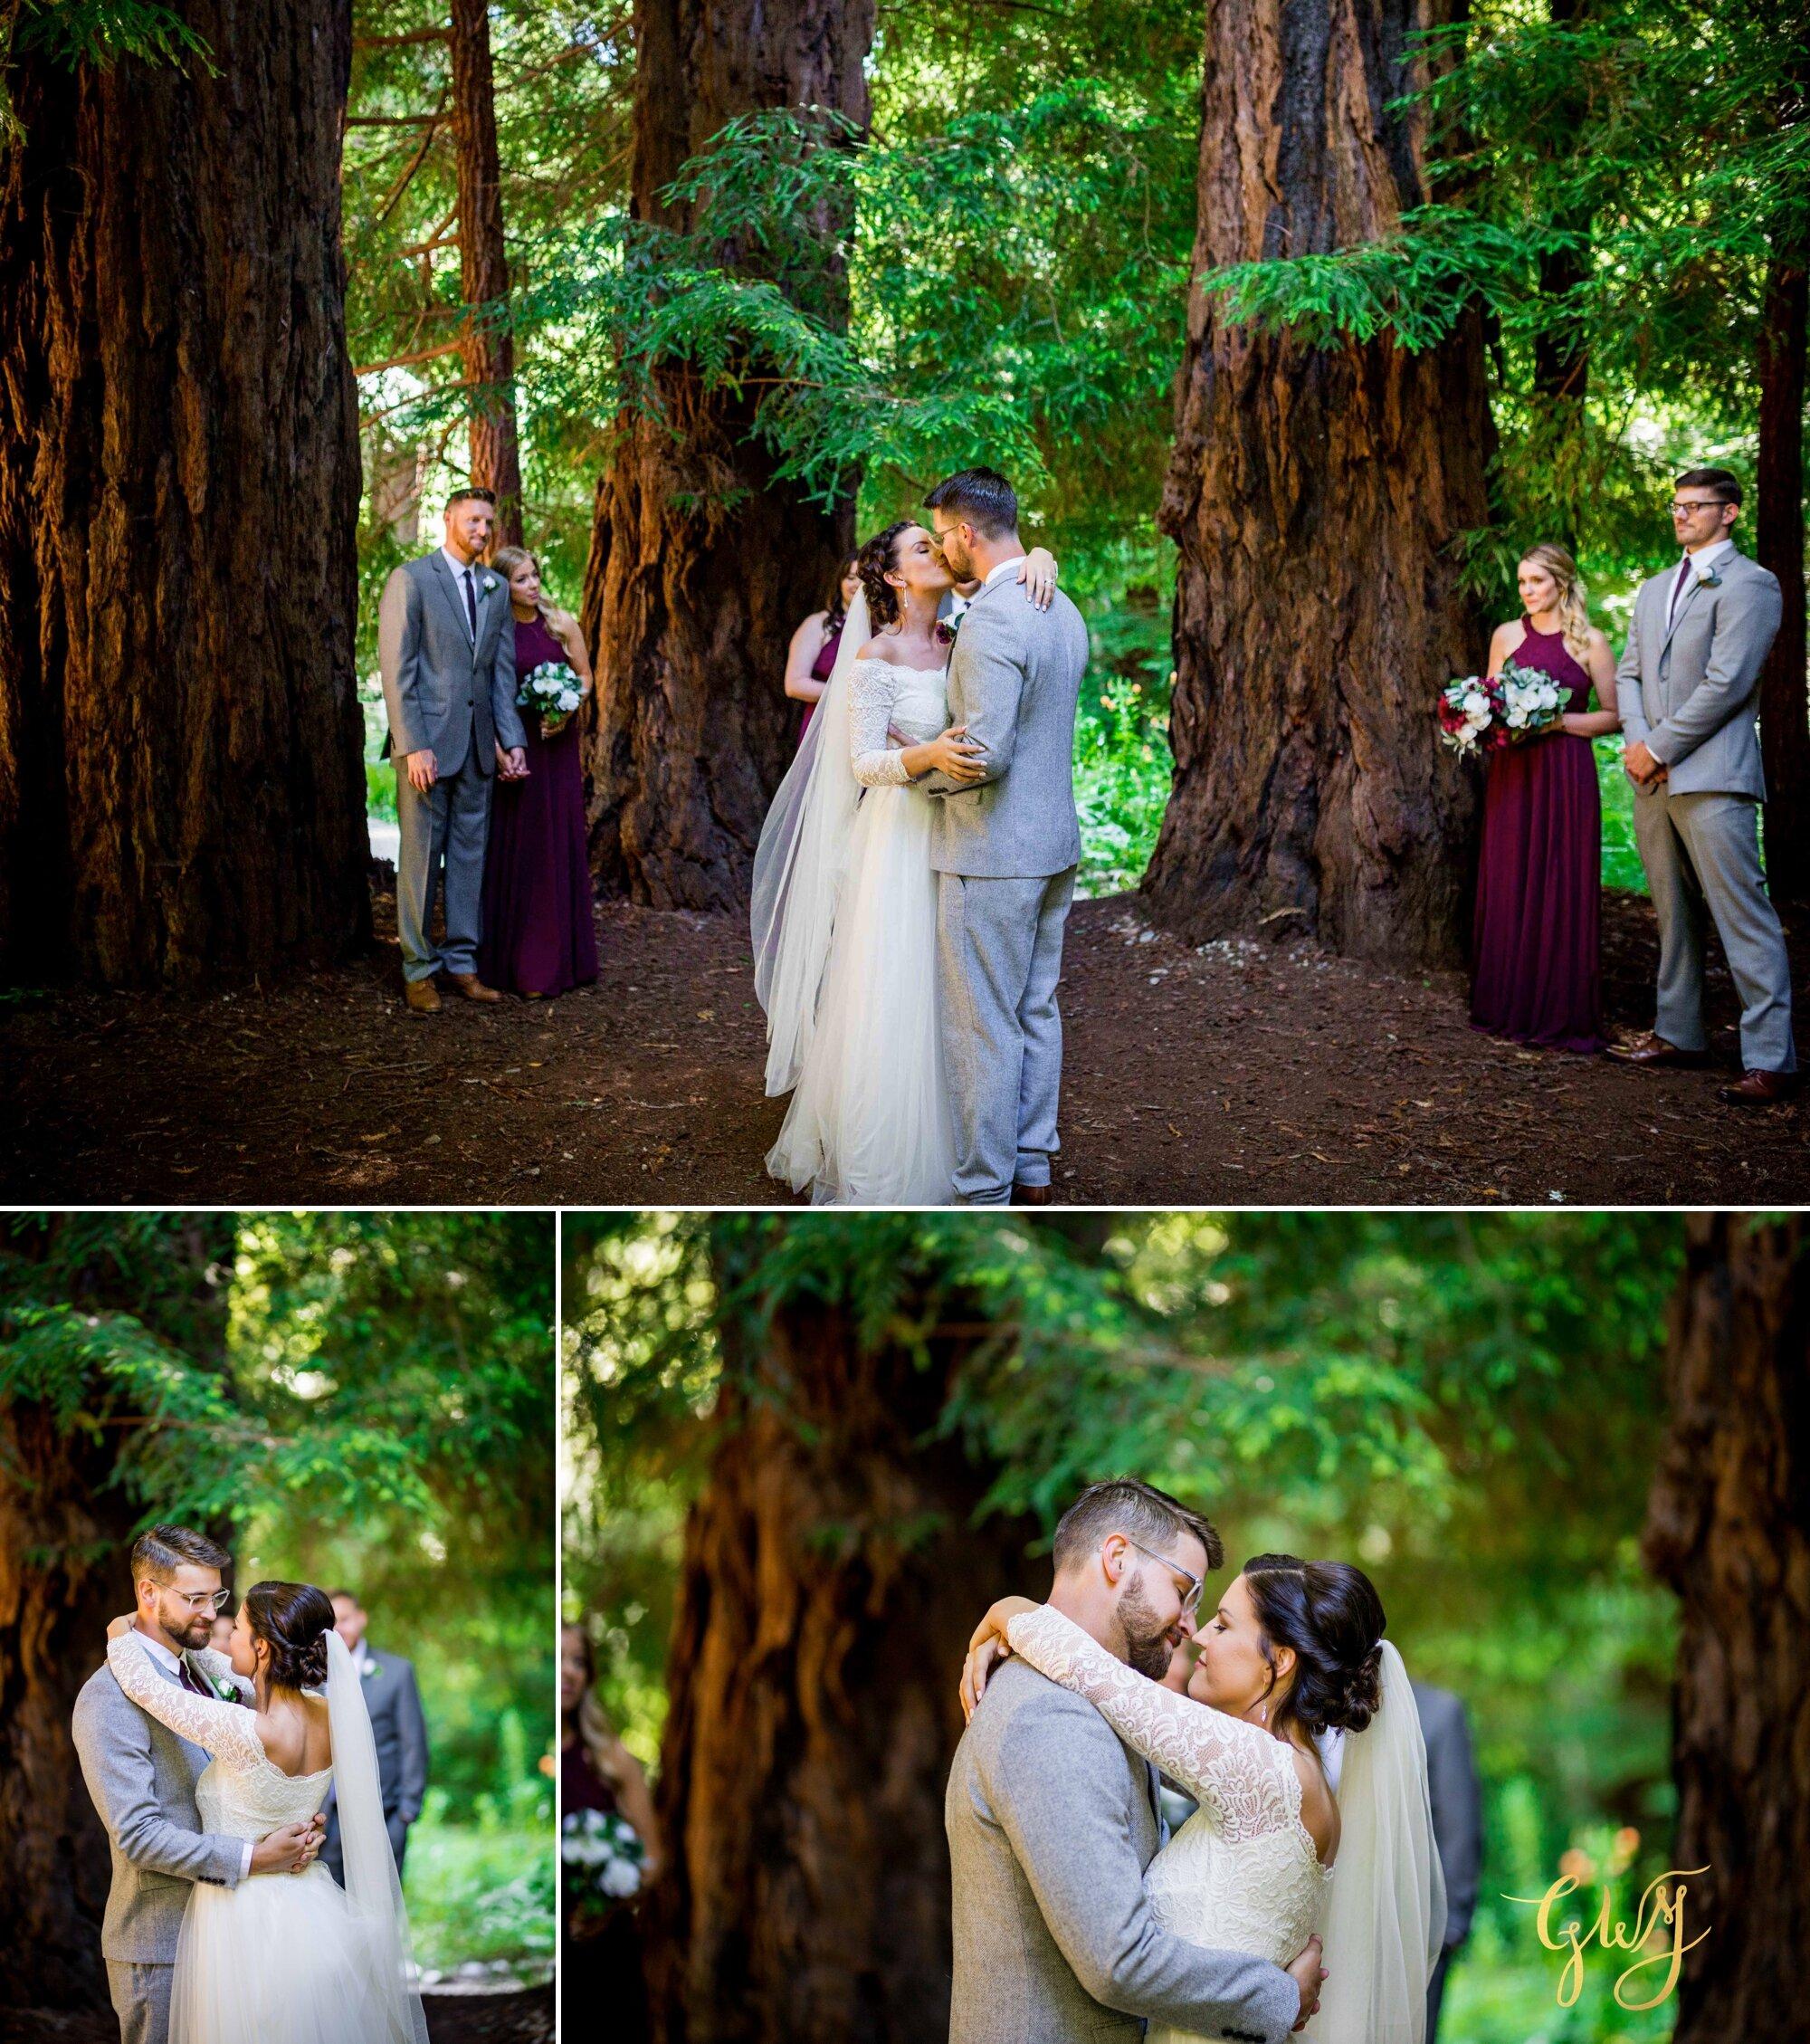 Casey + Jordan's Intimate Big Sur Elopement in the Redwoods by Glass Woods Media 43.jpg